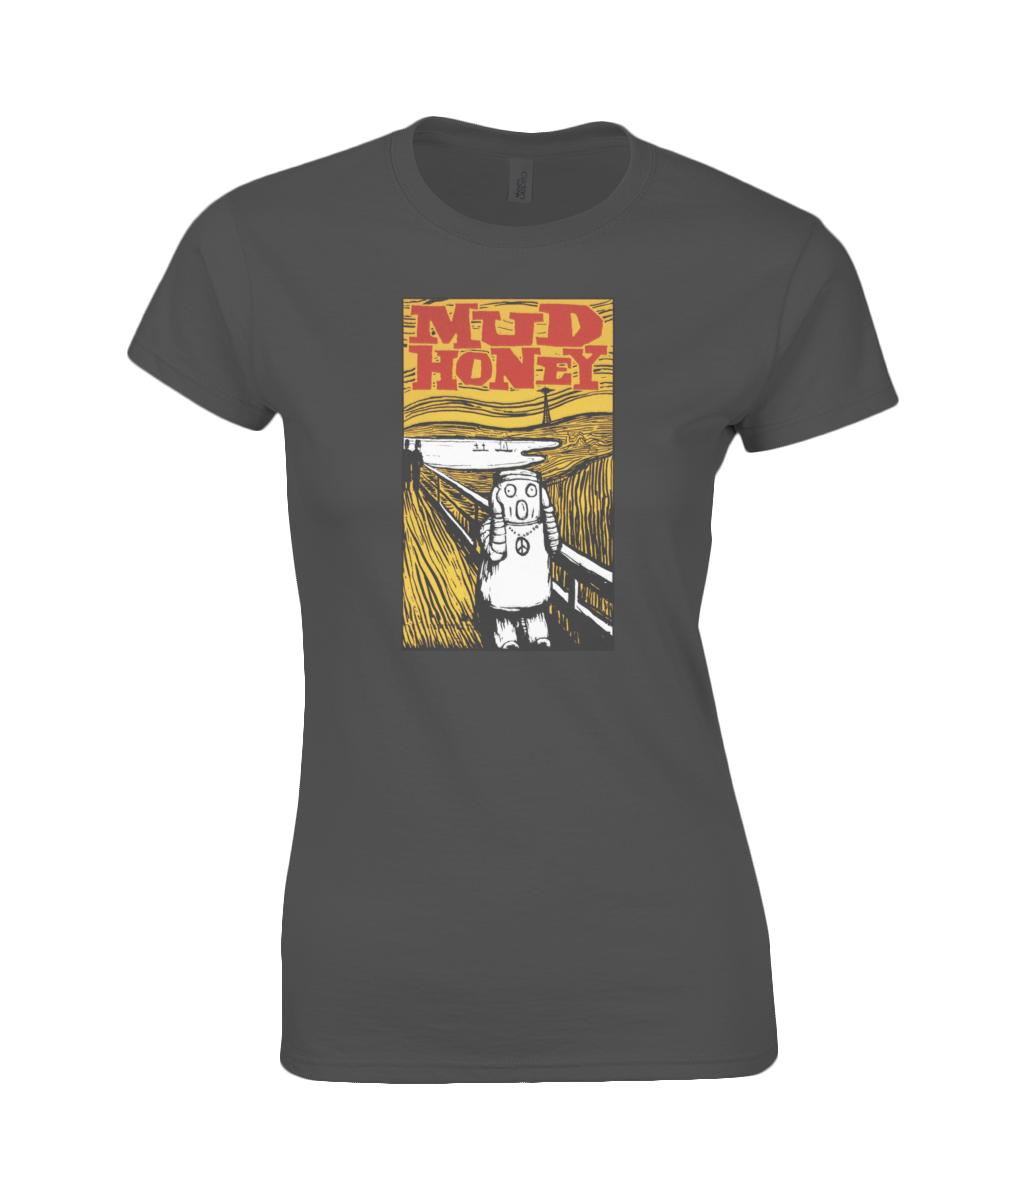 Vintage Rockabilly Shirt 50/'s Retro Dancing Skeletons 34 Sleeve Shirt